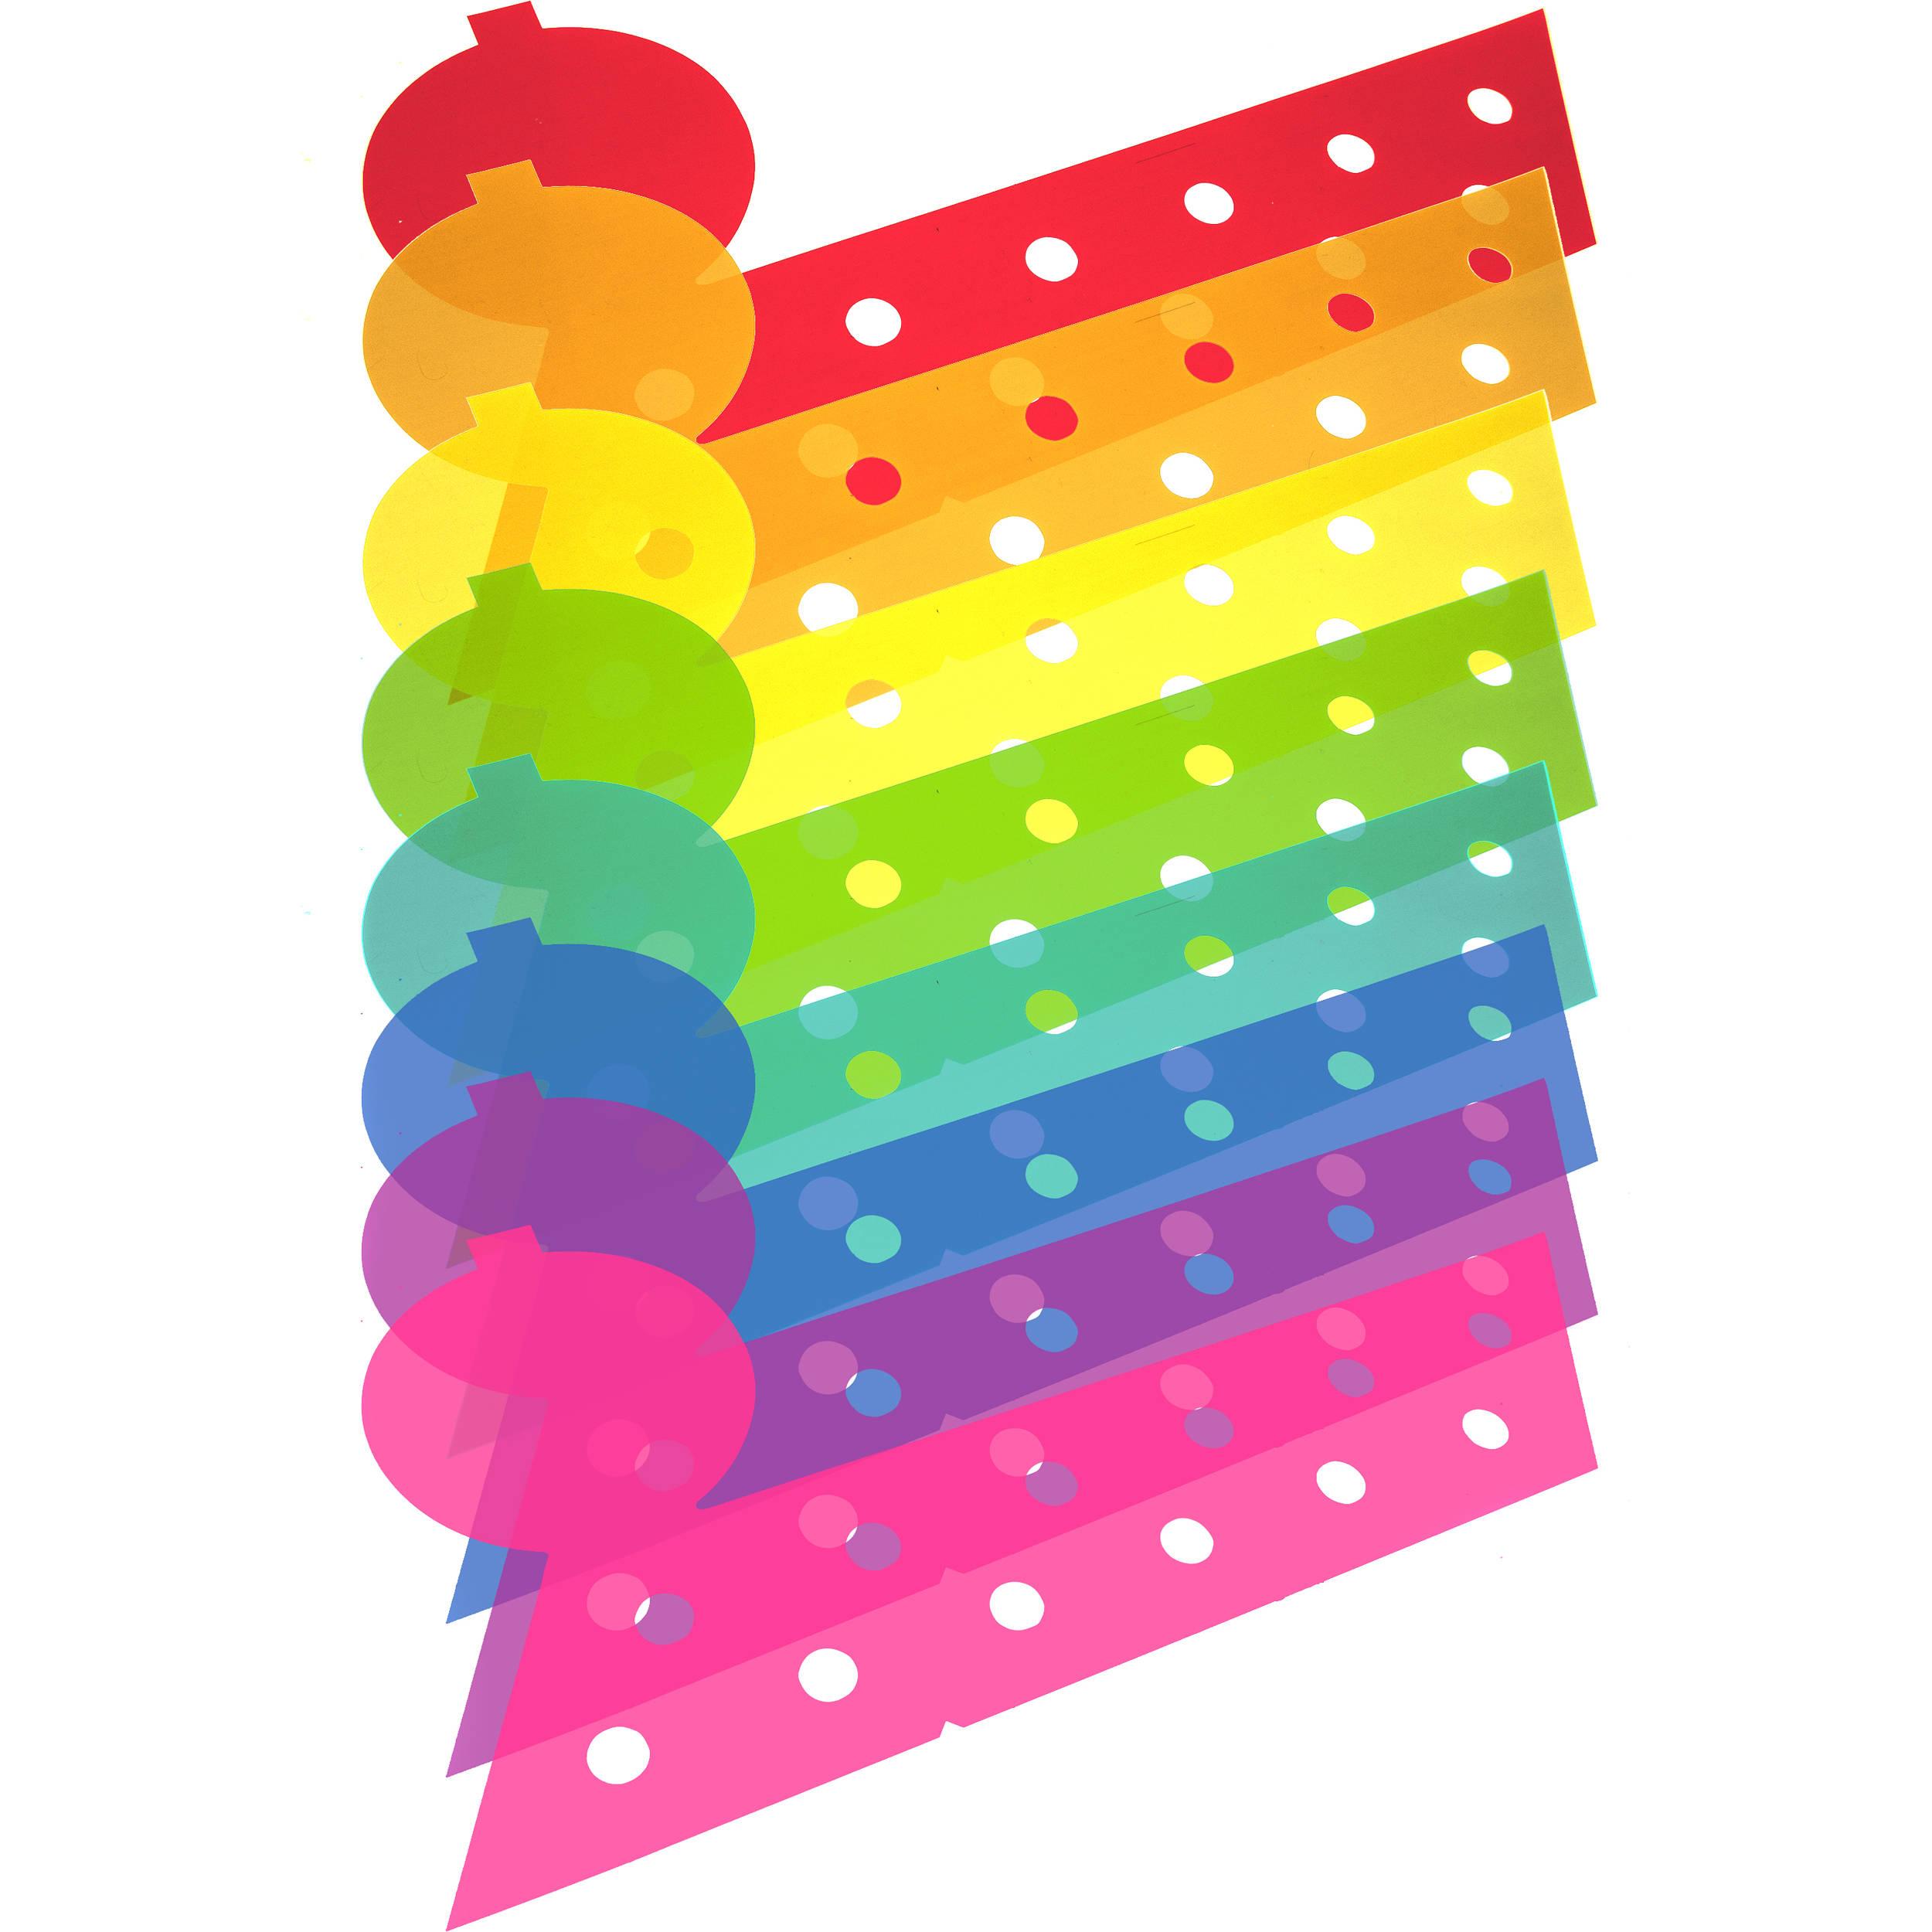 Flashgels Creative Color Gel Kit for Godox AD360 AD200 and eVOLVStrobes Flashpoint Streaklight